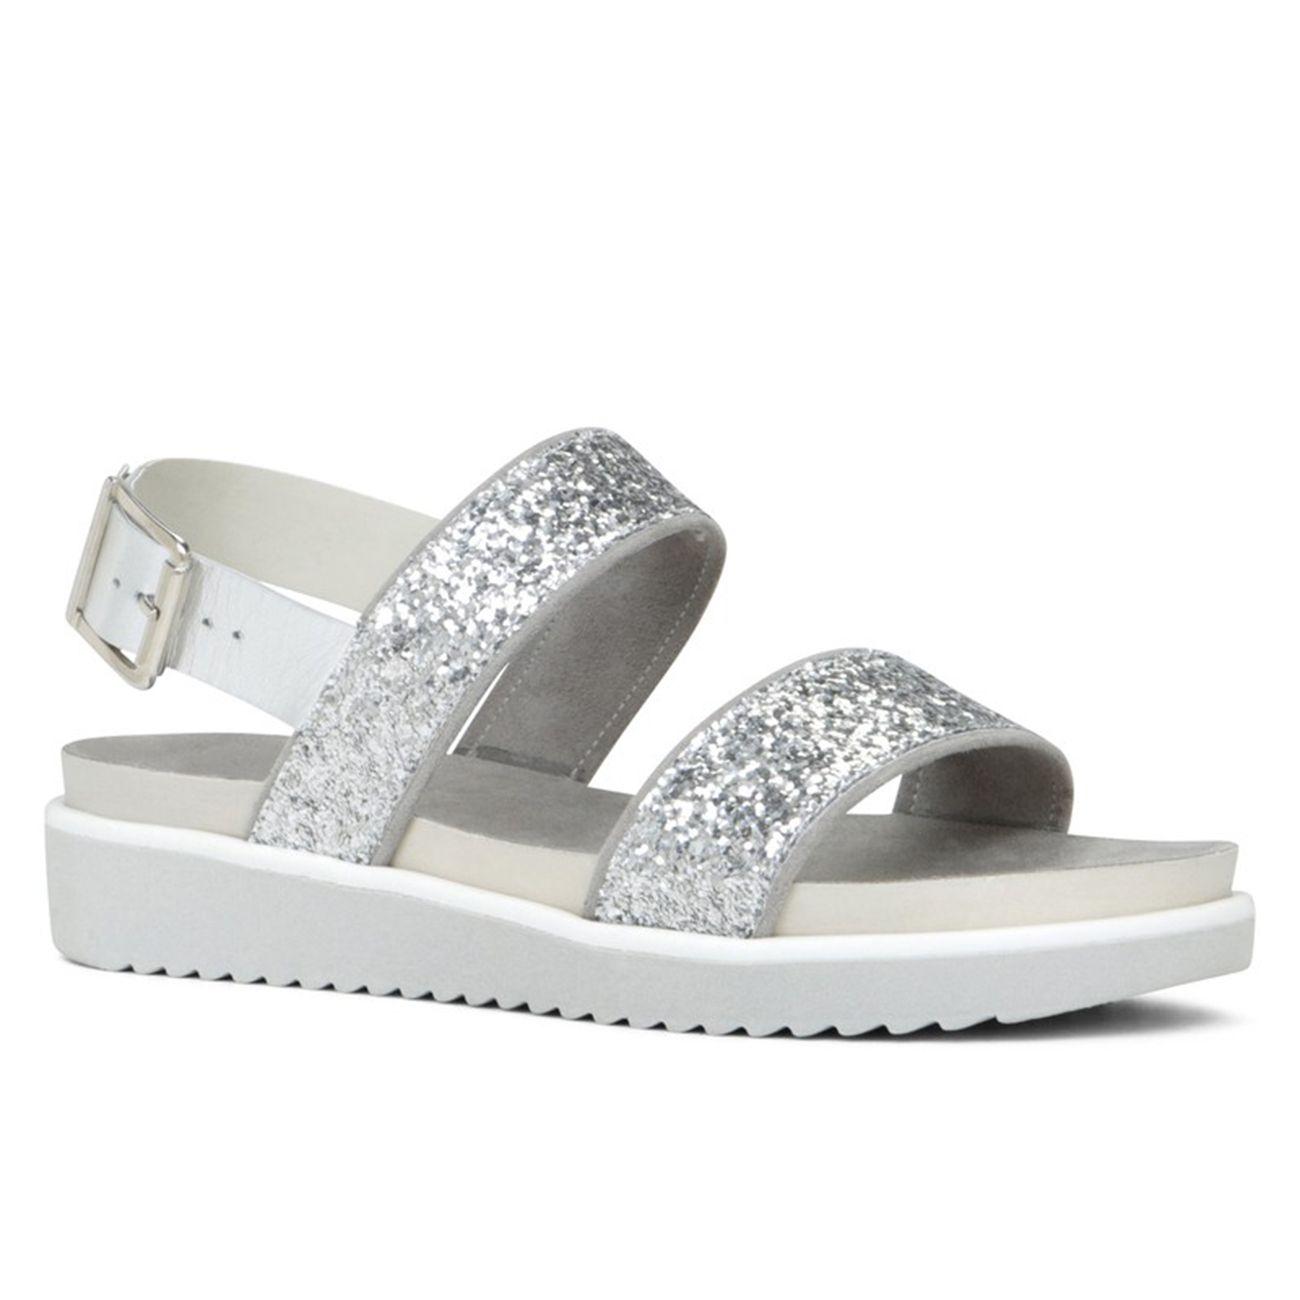 Sandalo con suola rialzata e fasce glitter, <strong>Aldo</strong>